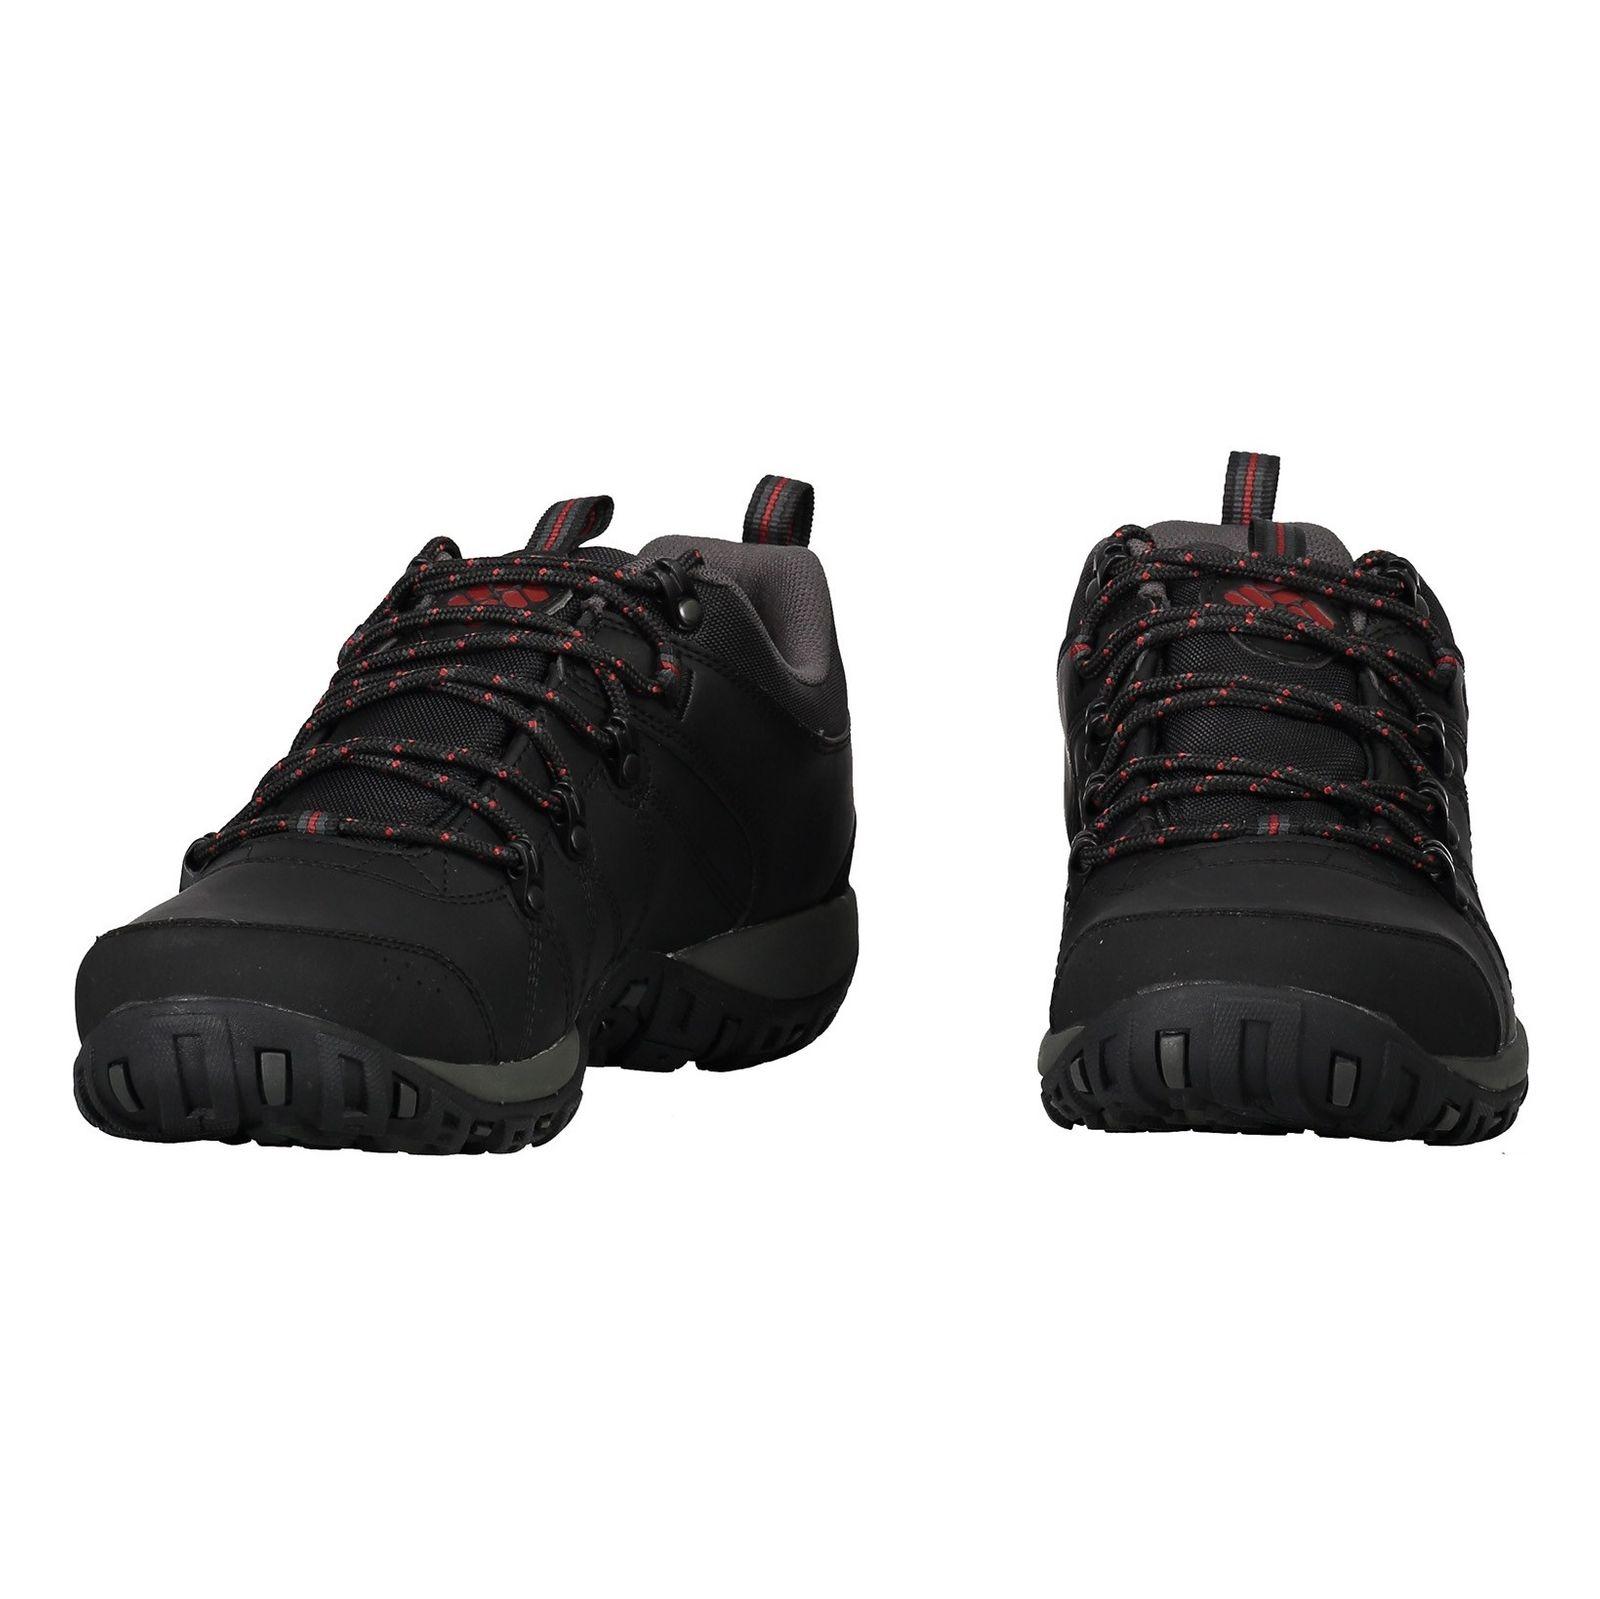 کفش طبیعت گردی بندی مردانه Peakfreak Venture - کلمبیا - مشکي - 4